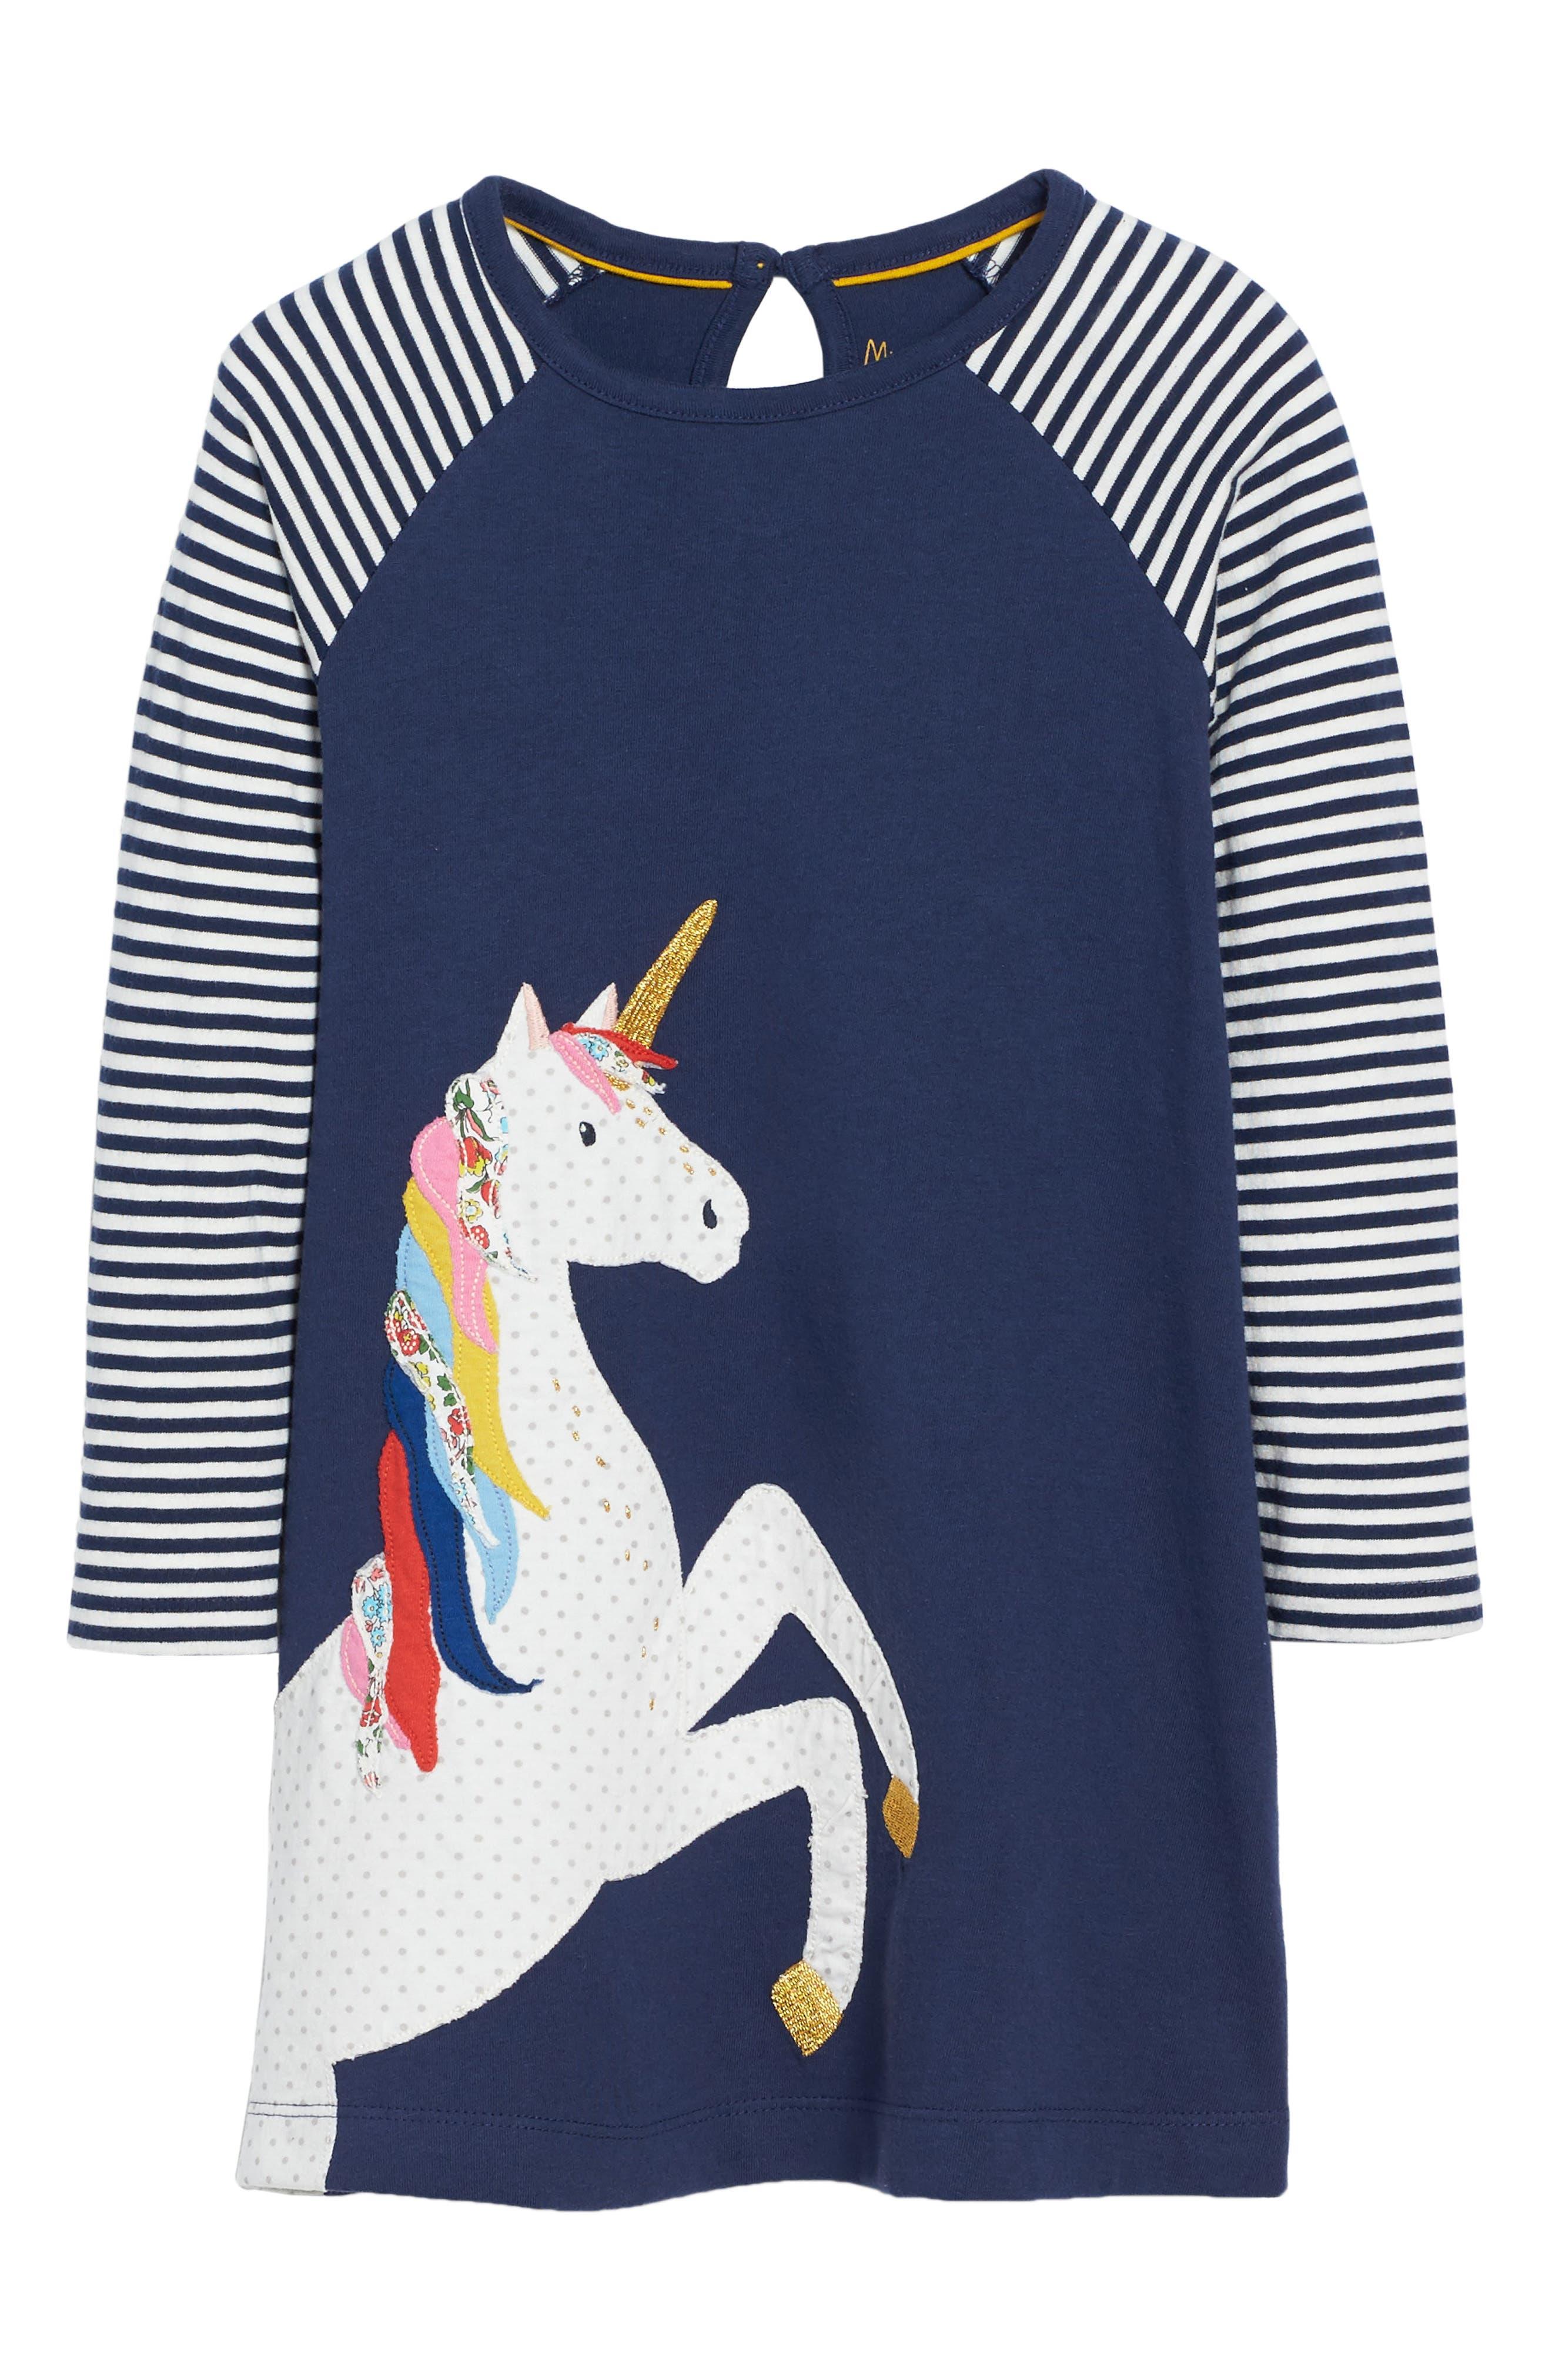 Alternate Image 1 Selected - Mini Boden Big Appliqué Jersey Dress (Toddler Girls, Little Girls & Big Girls)